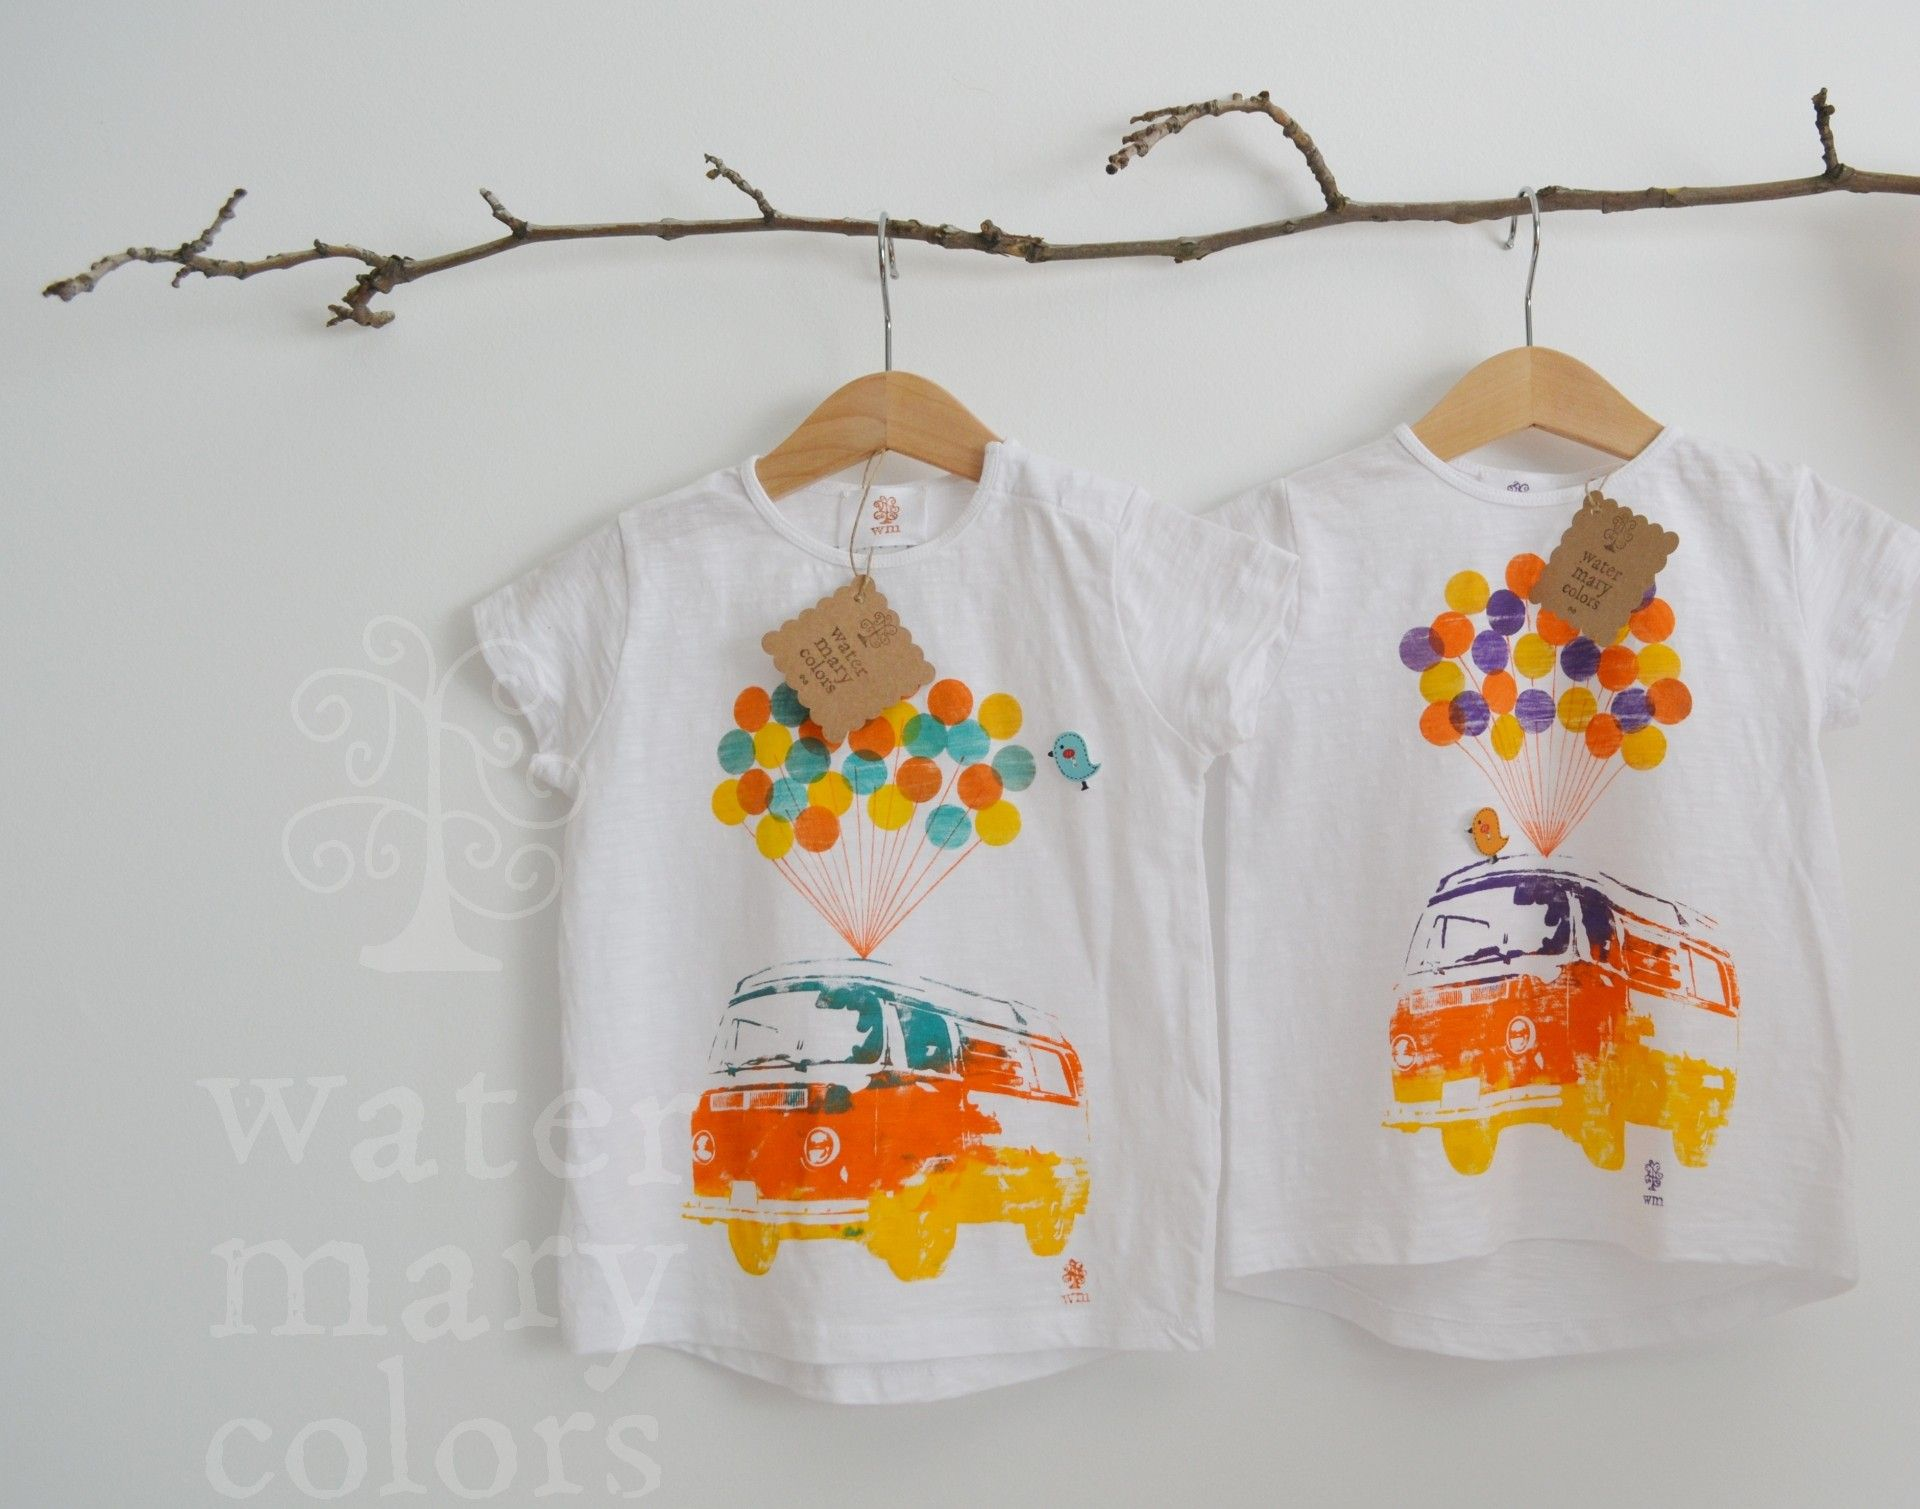 Camisetas infantiles estampadas a mano motivo furgo hippie con globos http://marijoepintora.blogspot.com.es/